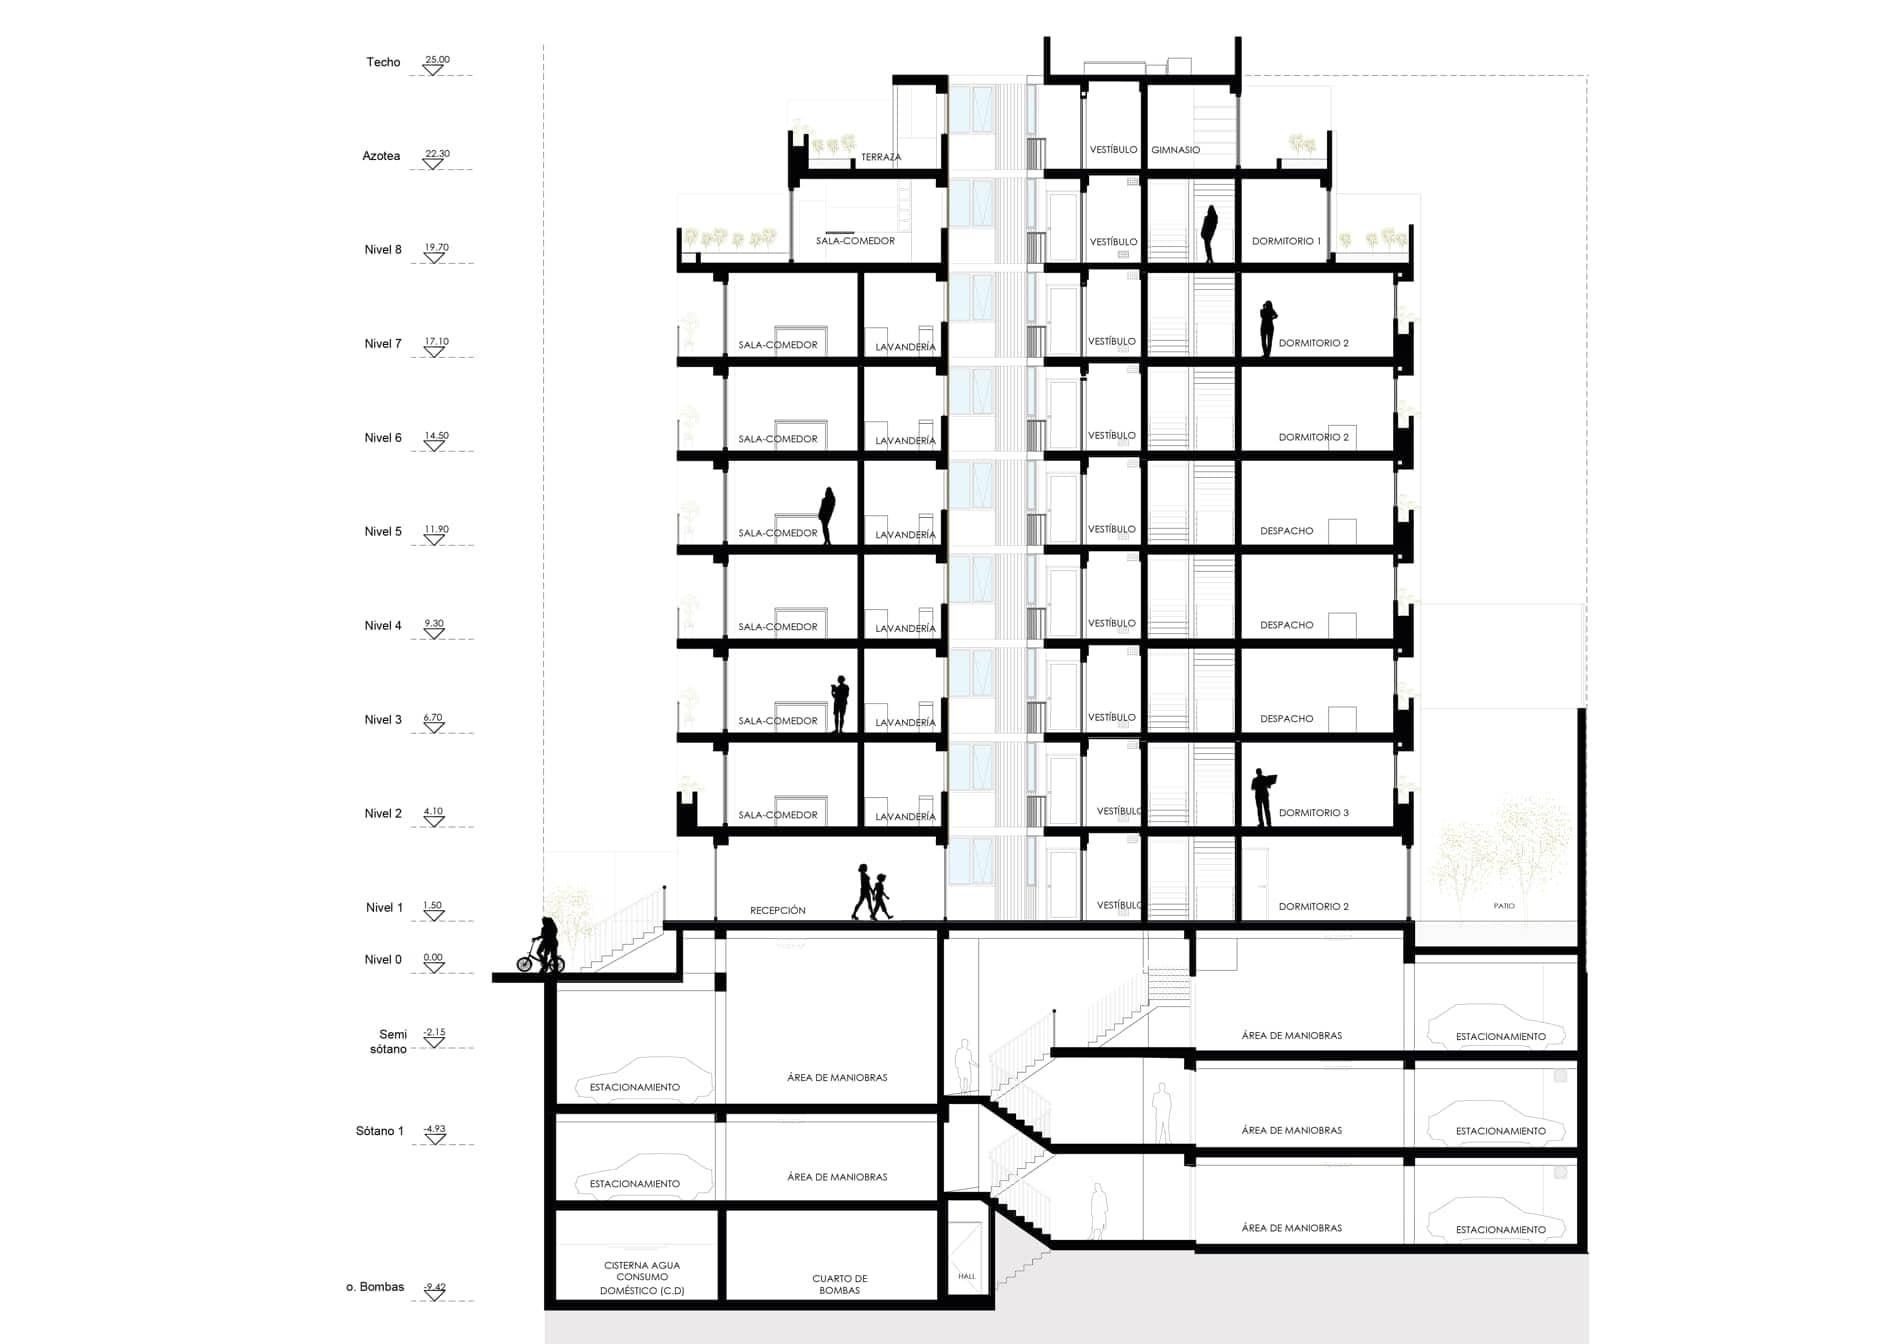 alt=Corte 1 de vivienda multifamiliar calle francia